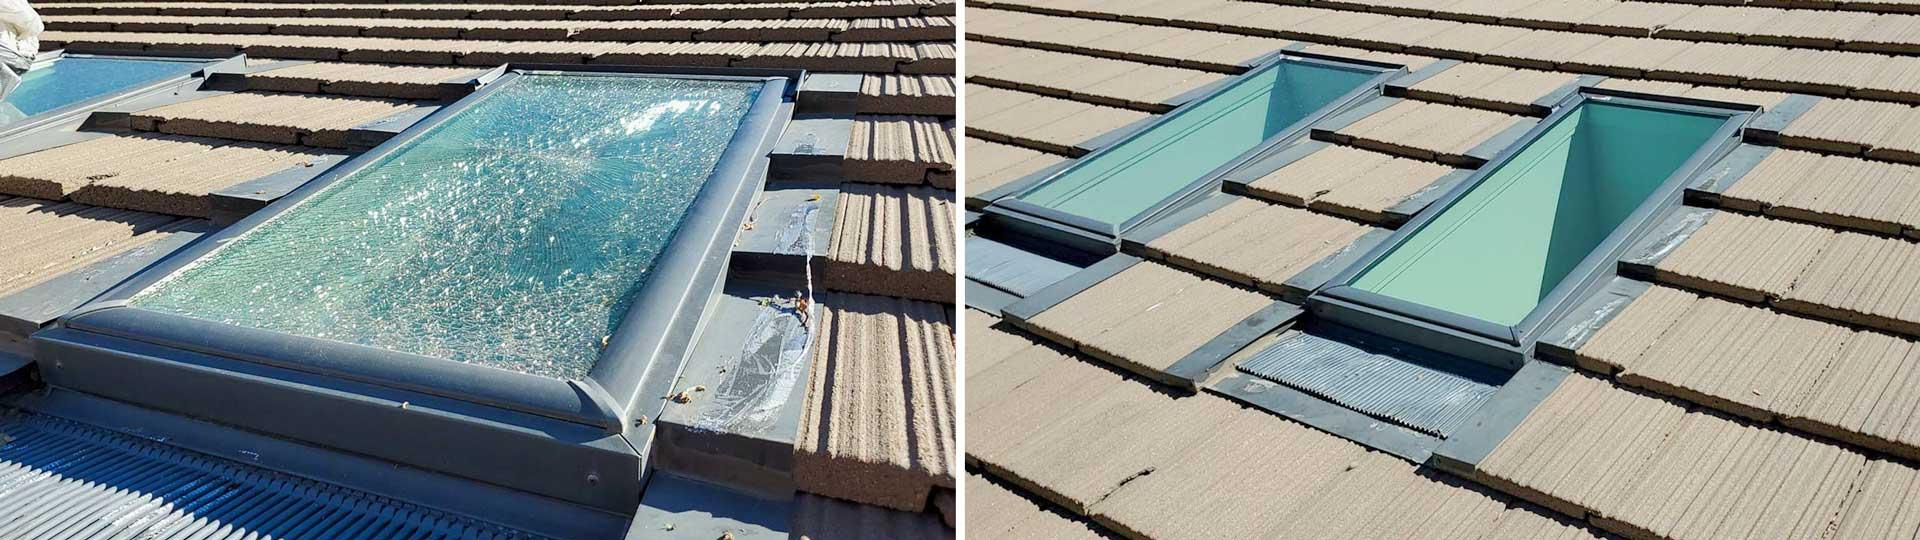 skylight glass replacement 19328 header